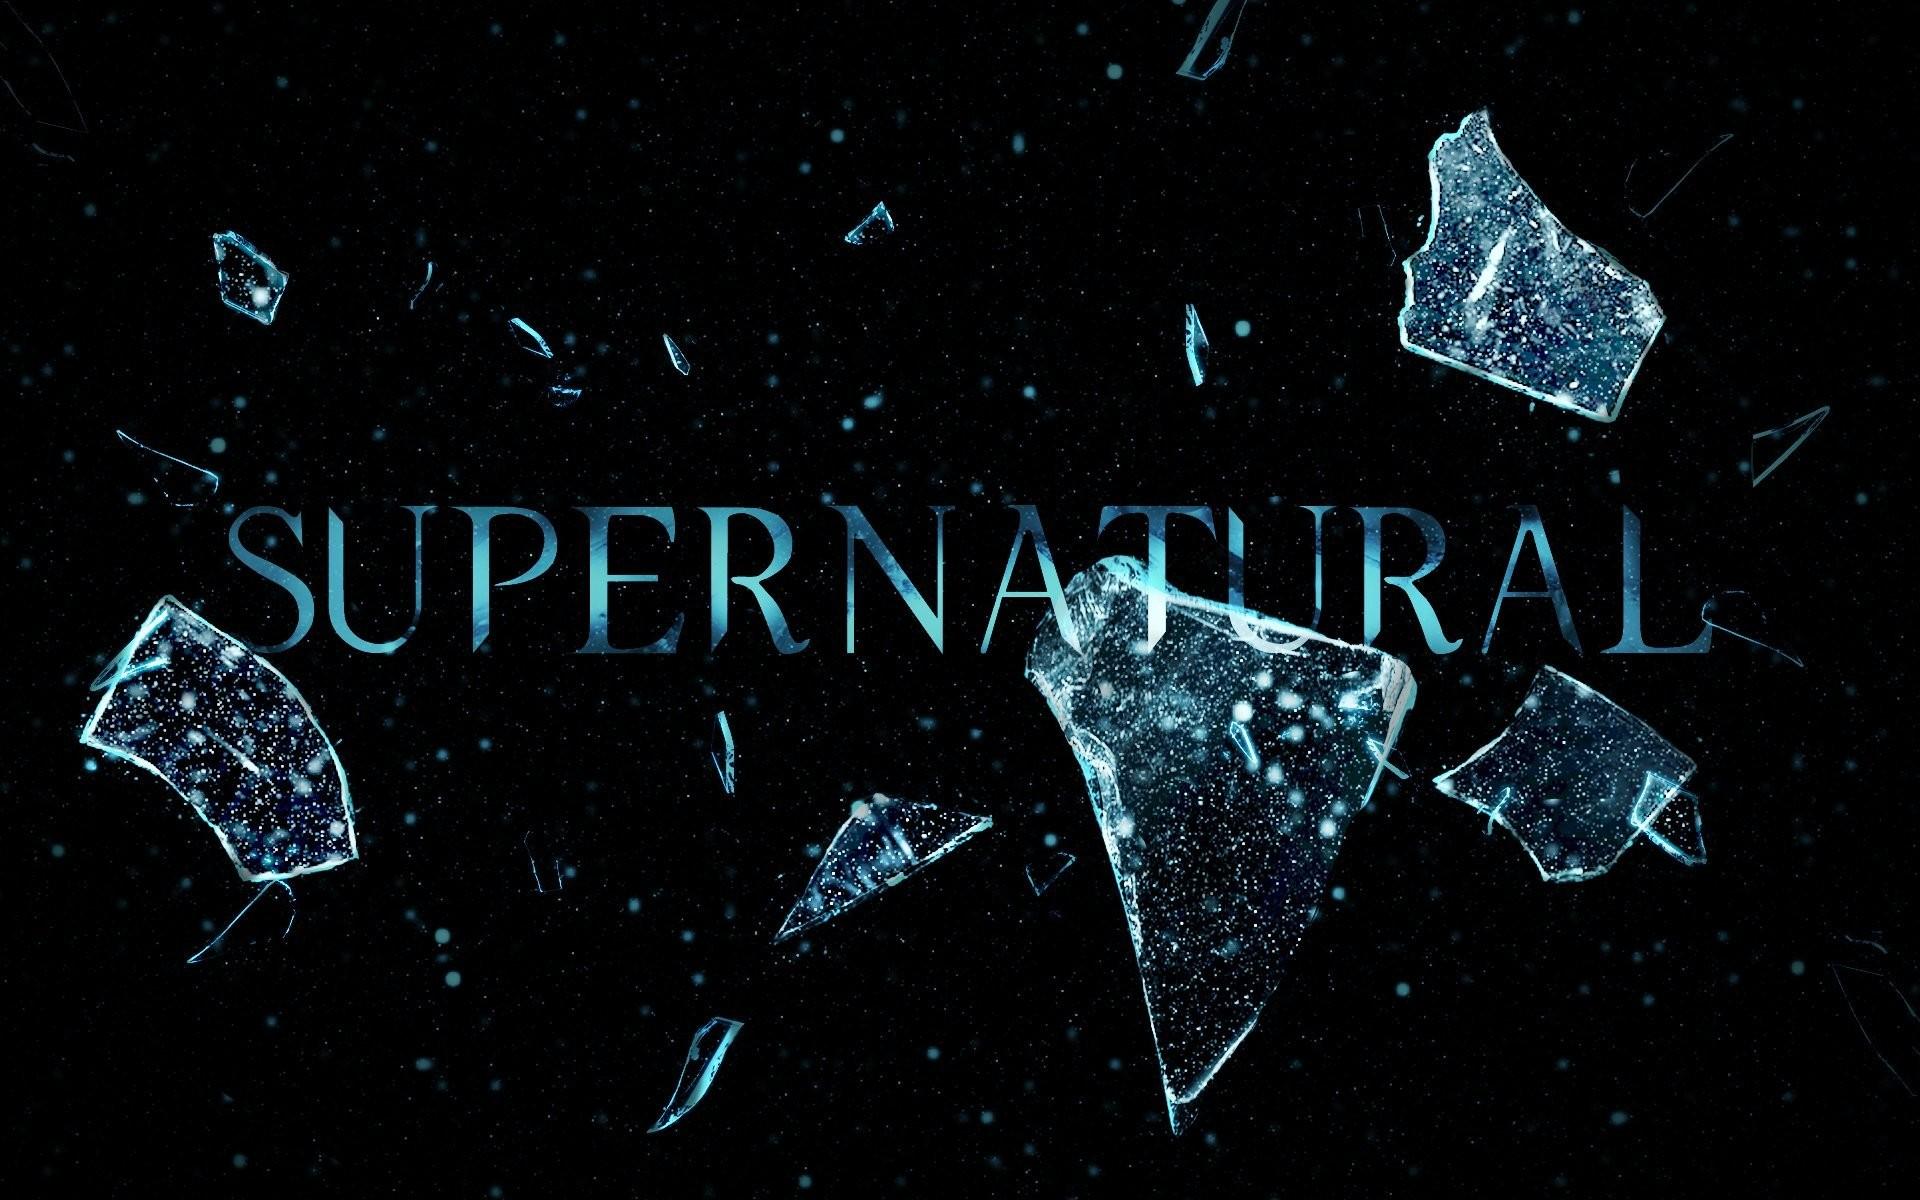 supernatural intro spn season 6 broken glass supernatural season 6 tv  series glass broken pieces. Your screen: 1024×1024